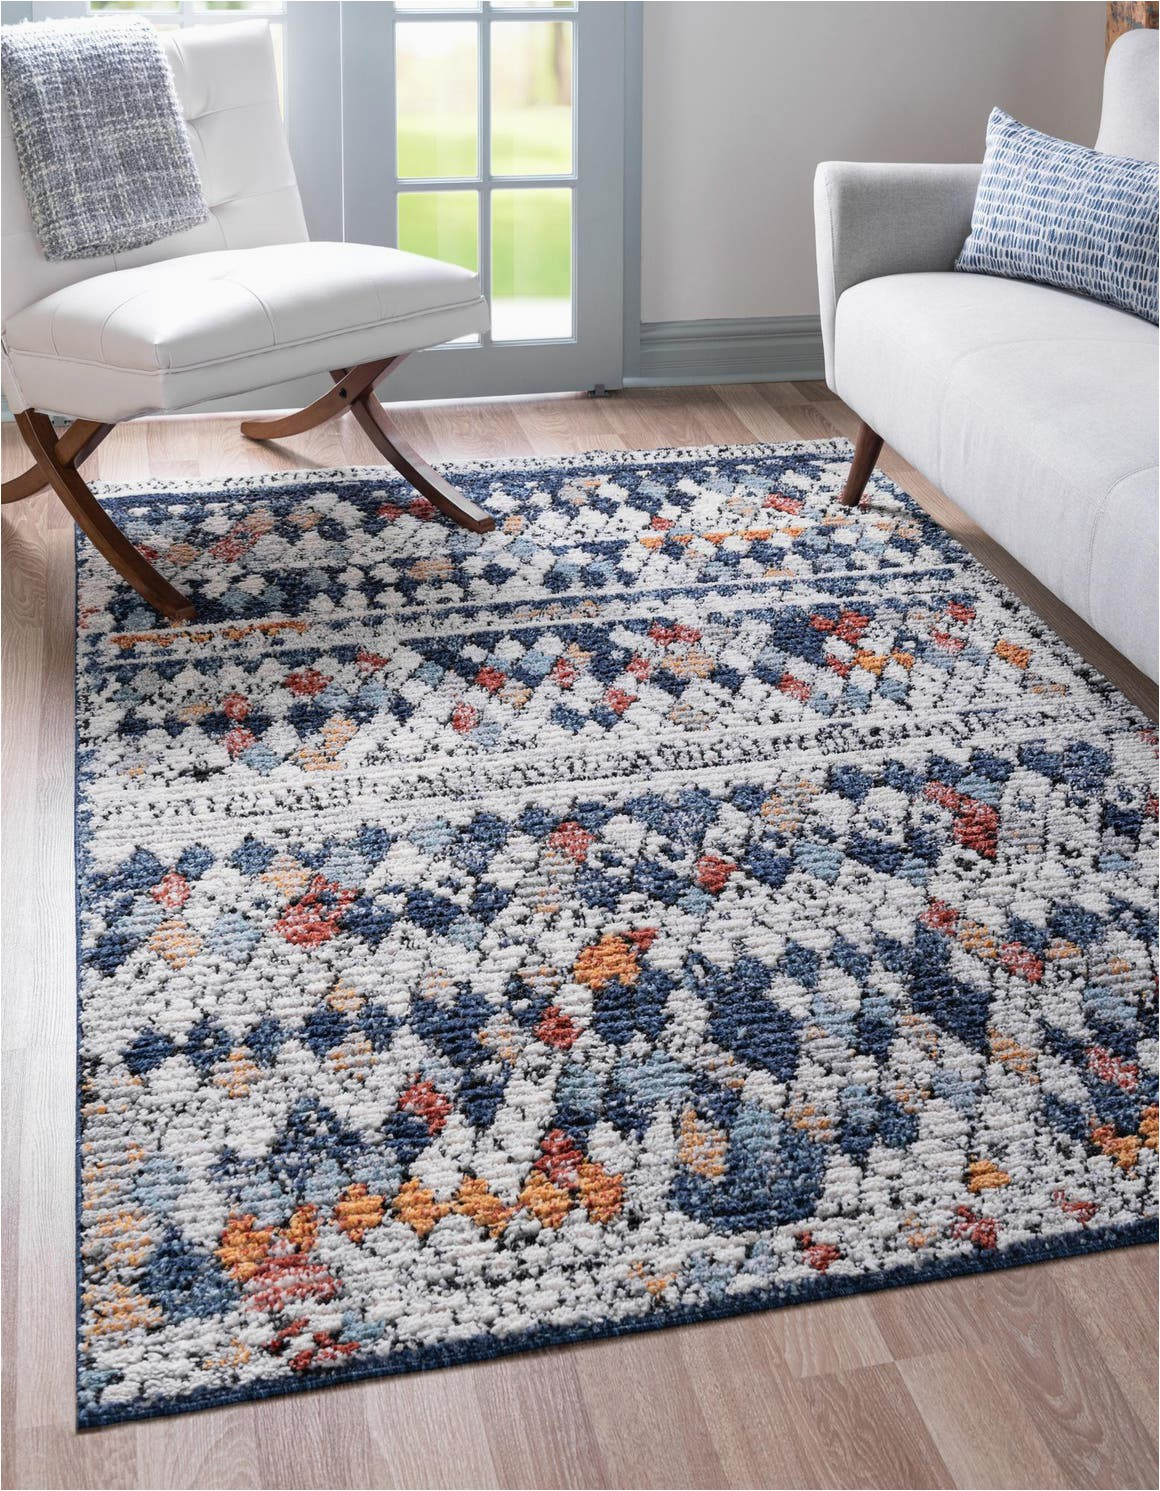 navy blue 4x6 morocco area rug